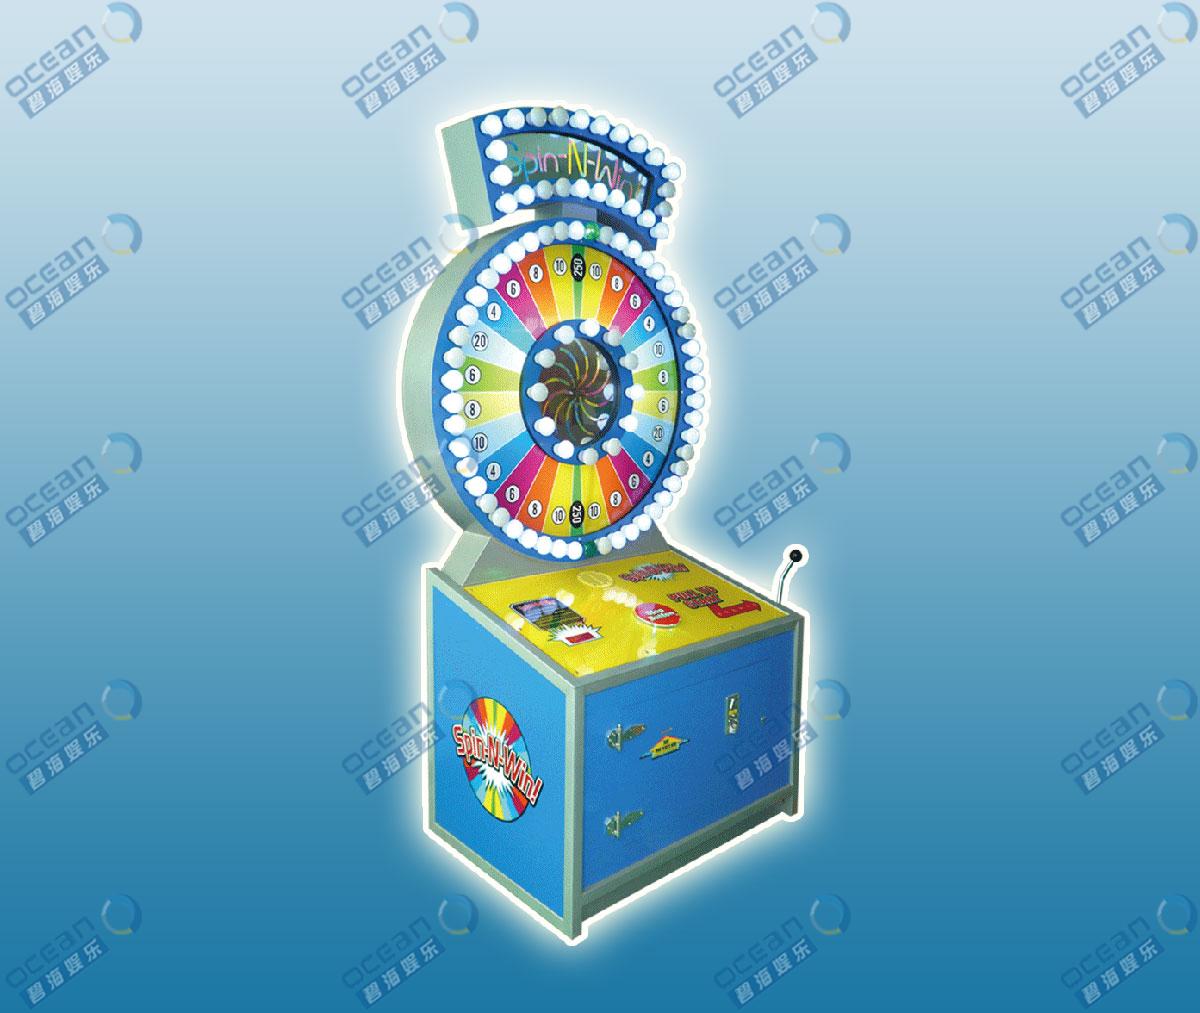 BH107 Super Spin